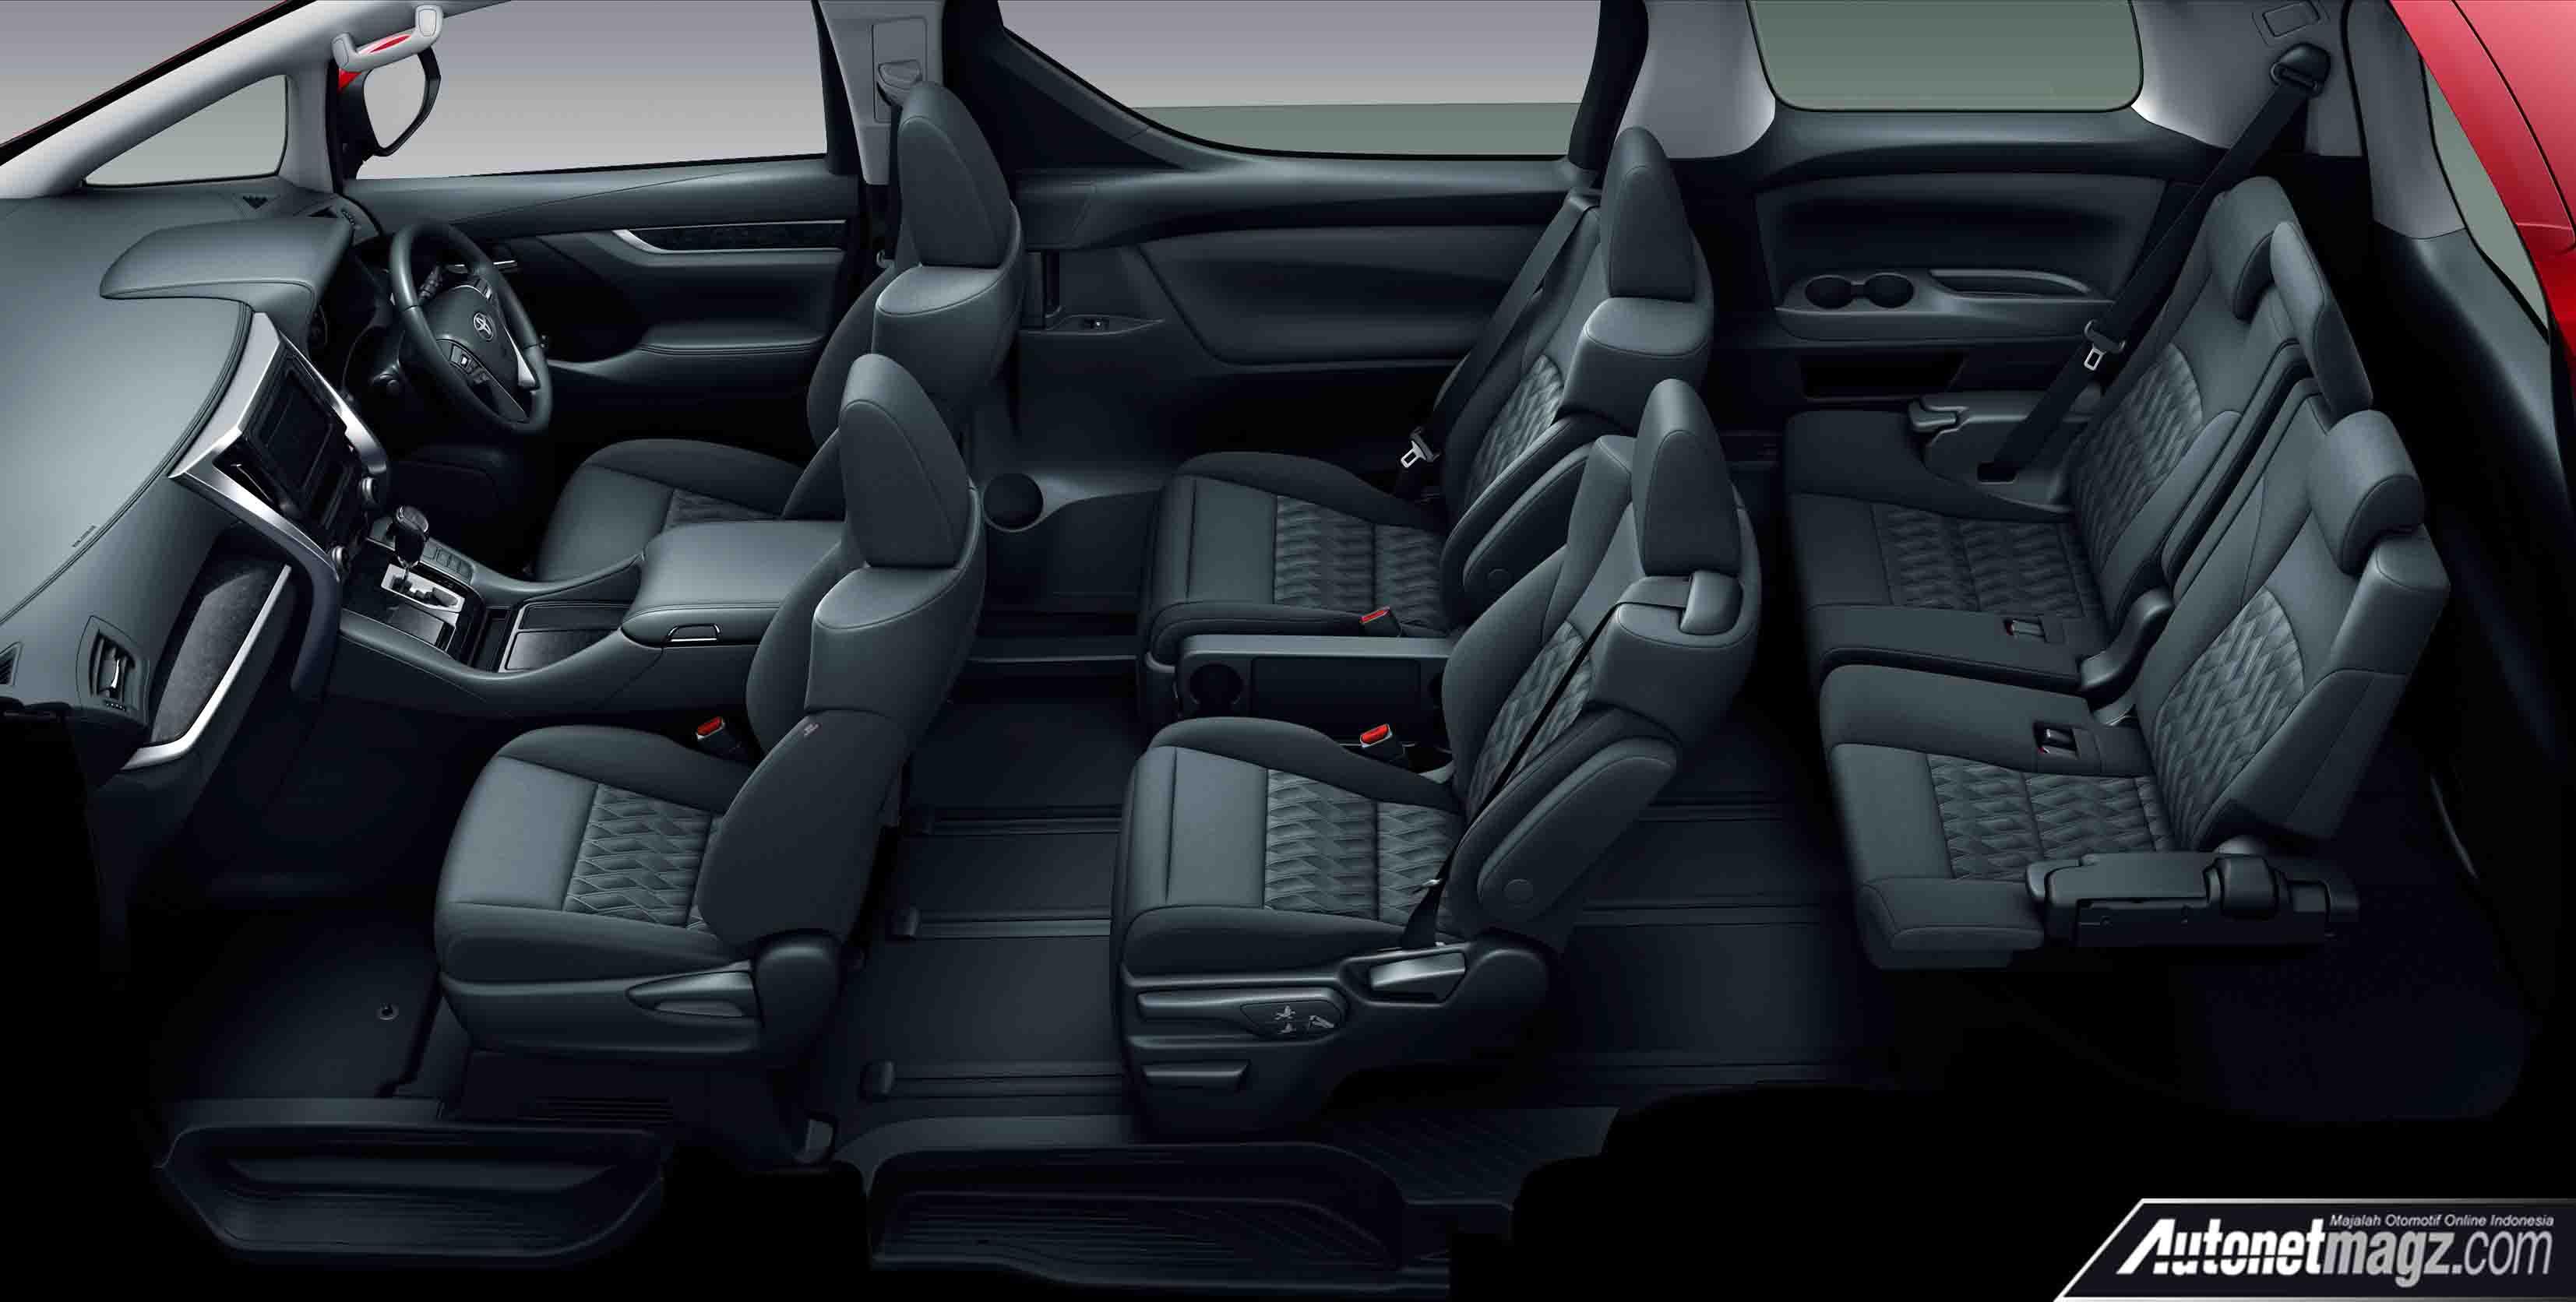 Interior Nappa Black Toyota Alphard Amp Vellfire Facelift 2018